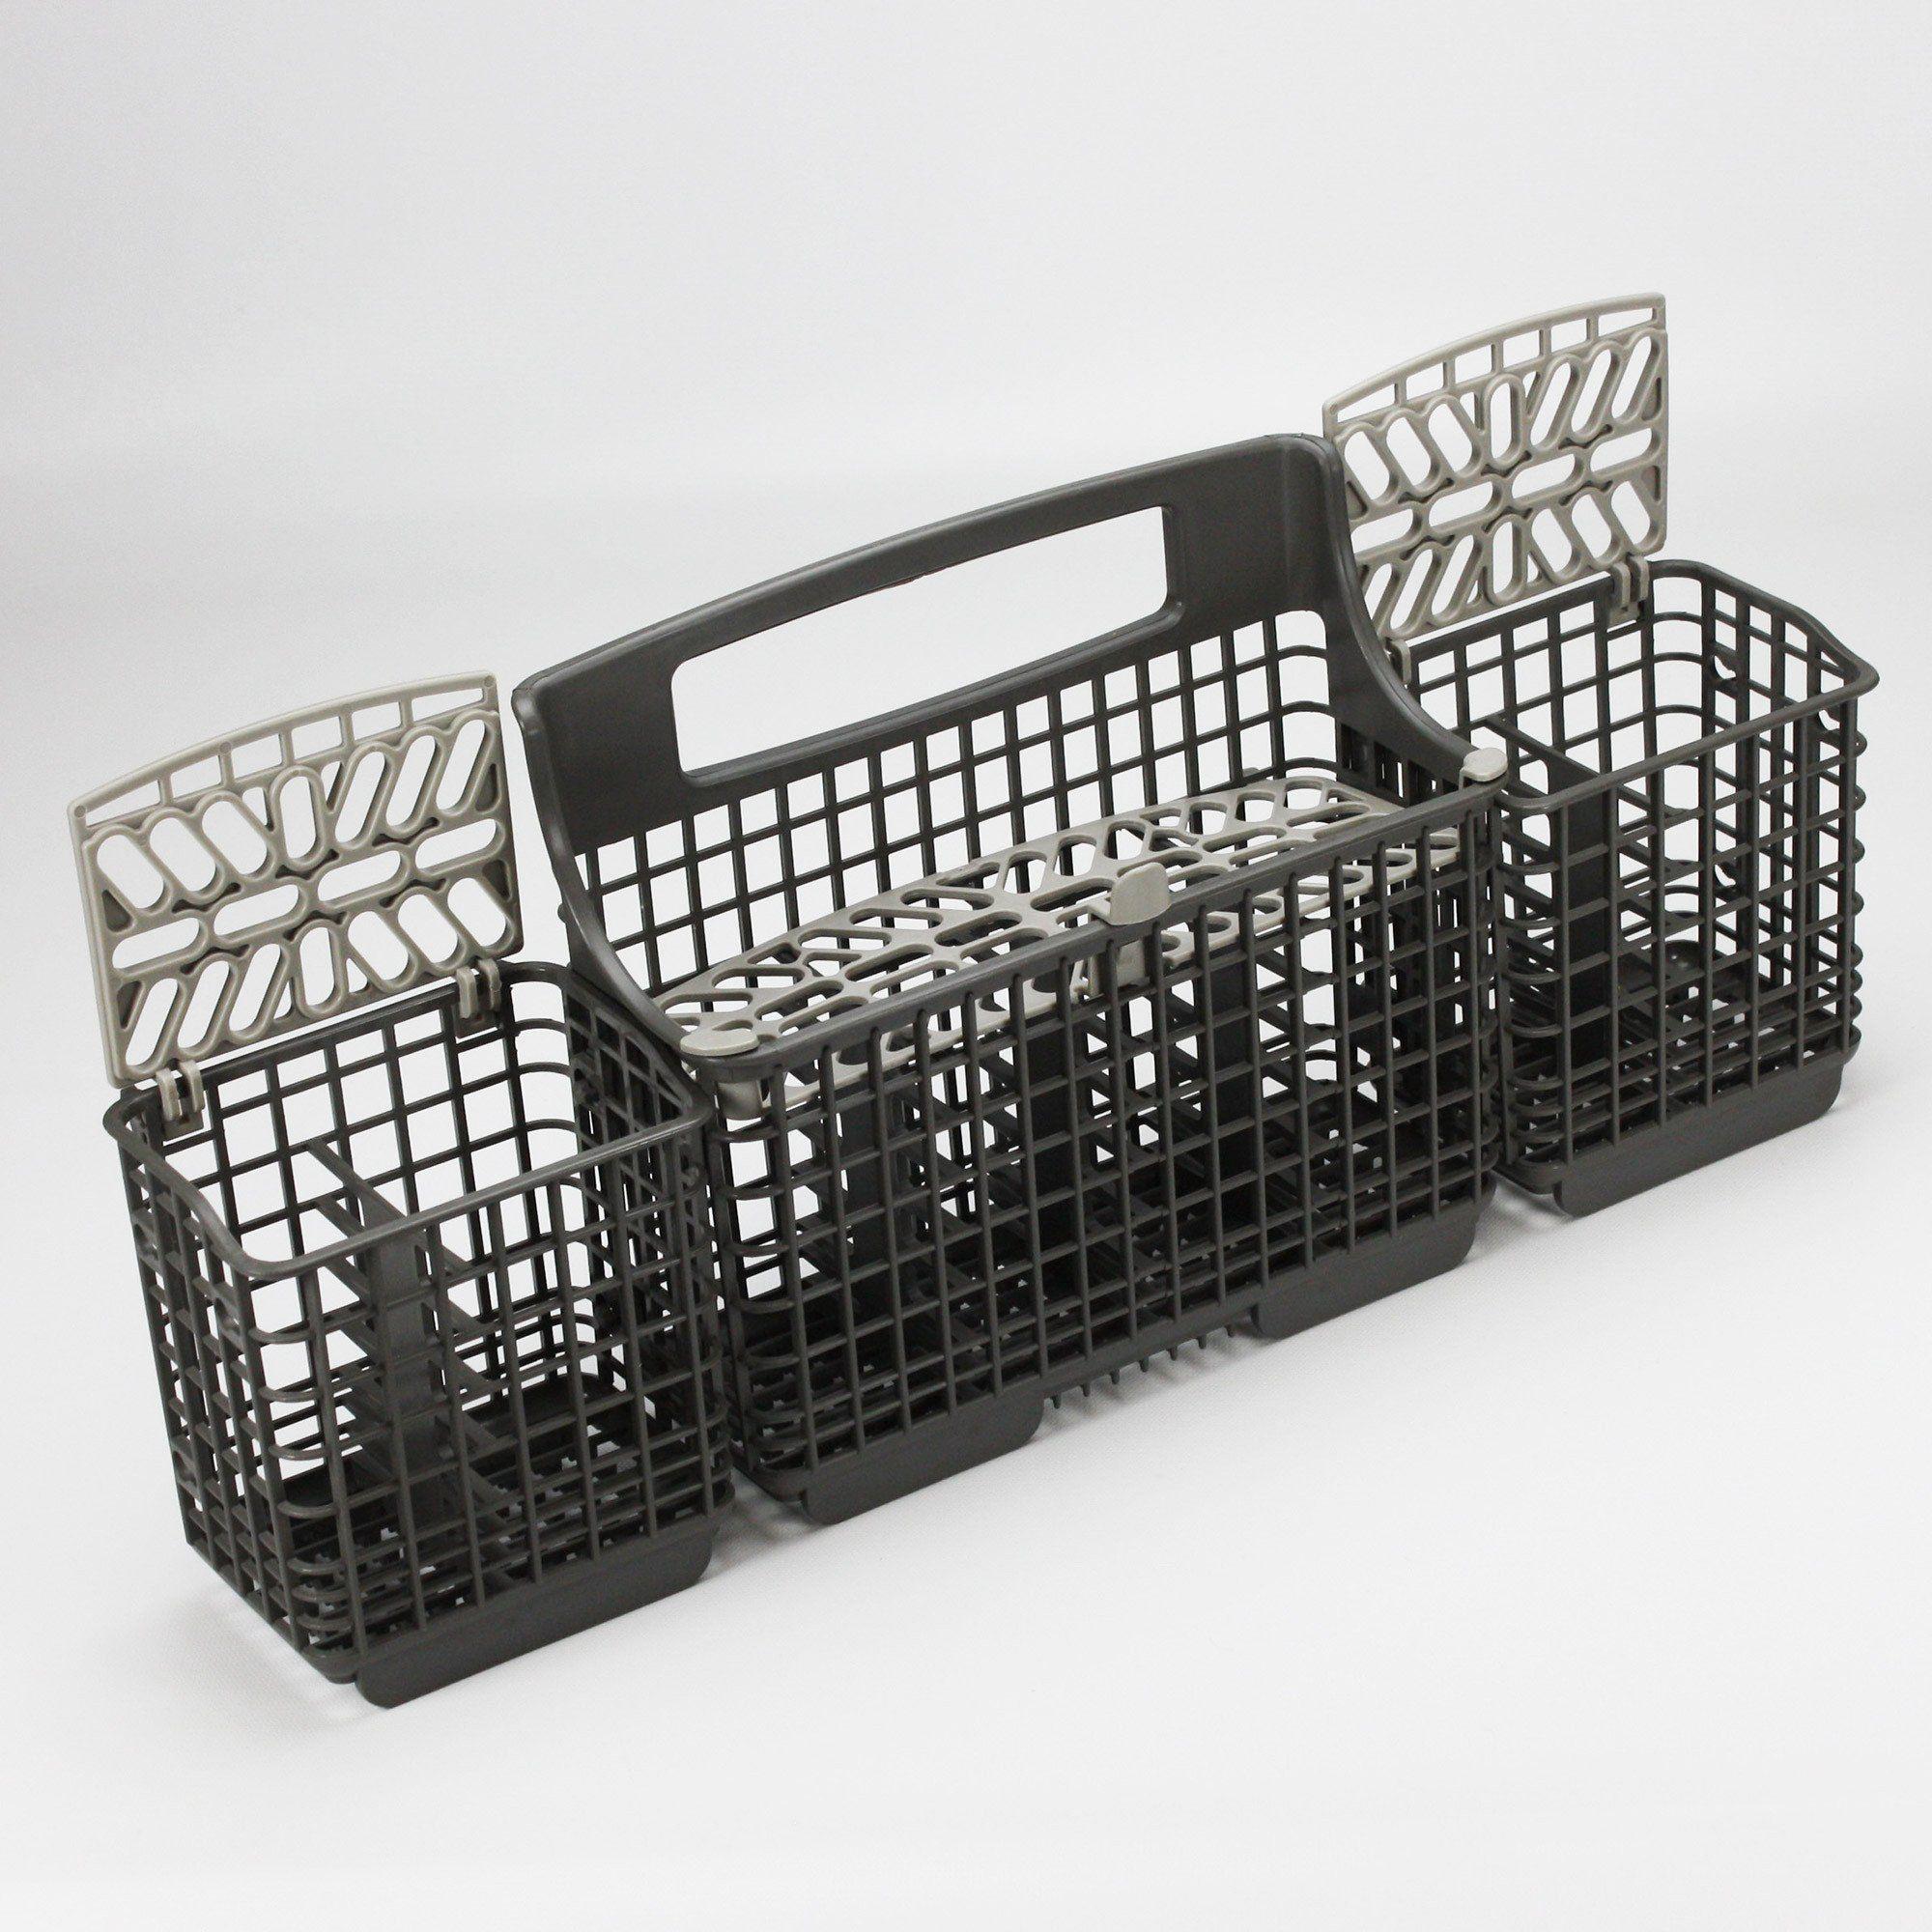 Kenmore Whirlpool Dishwasher Silverware Basket 8562080 W10807920